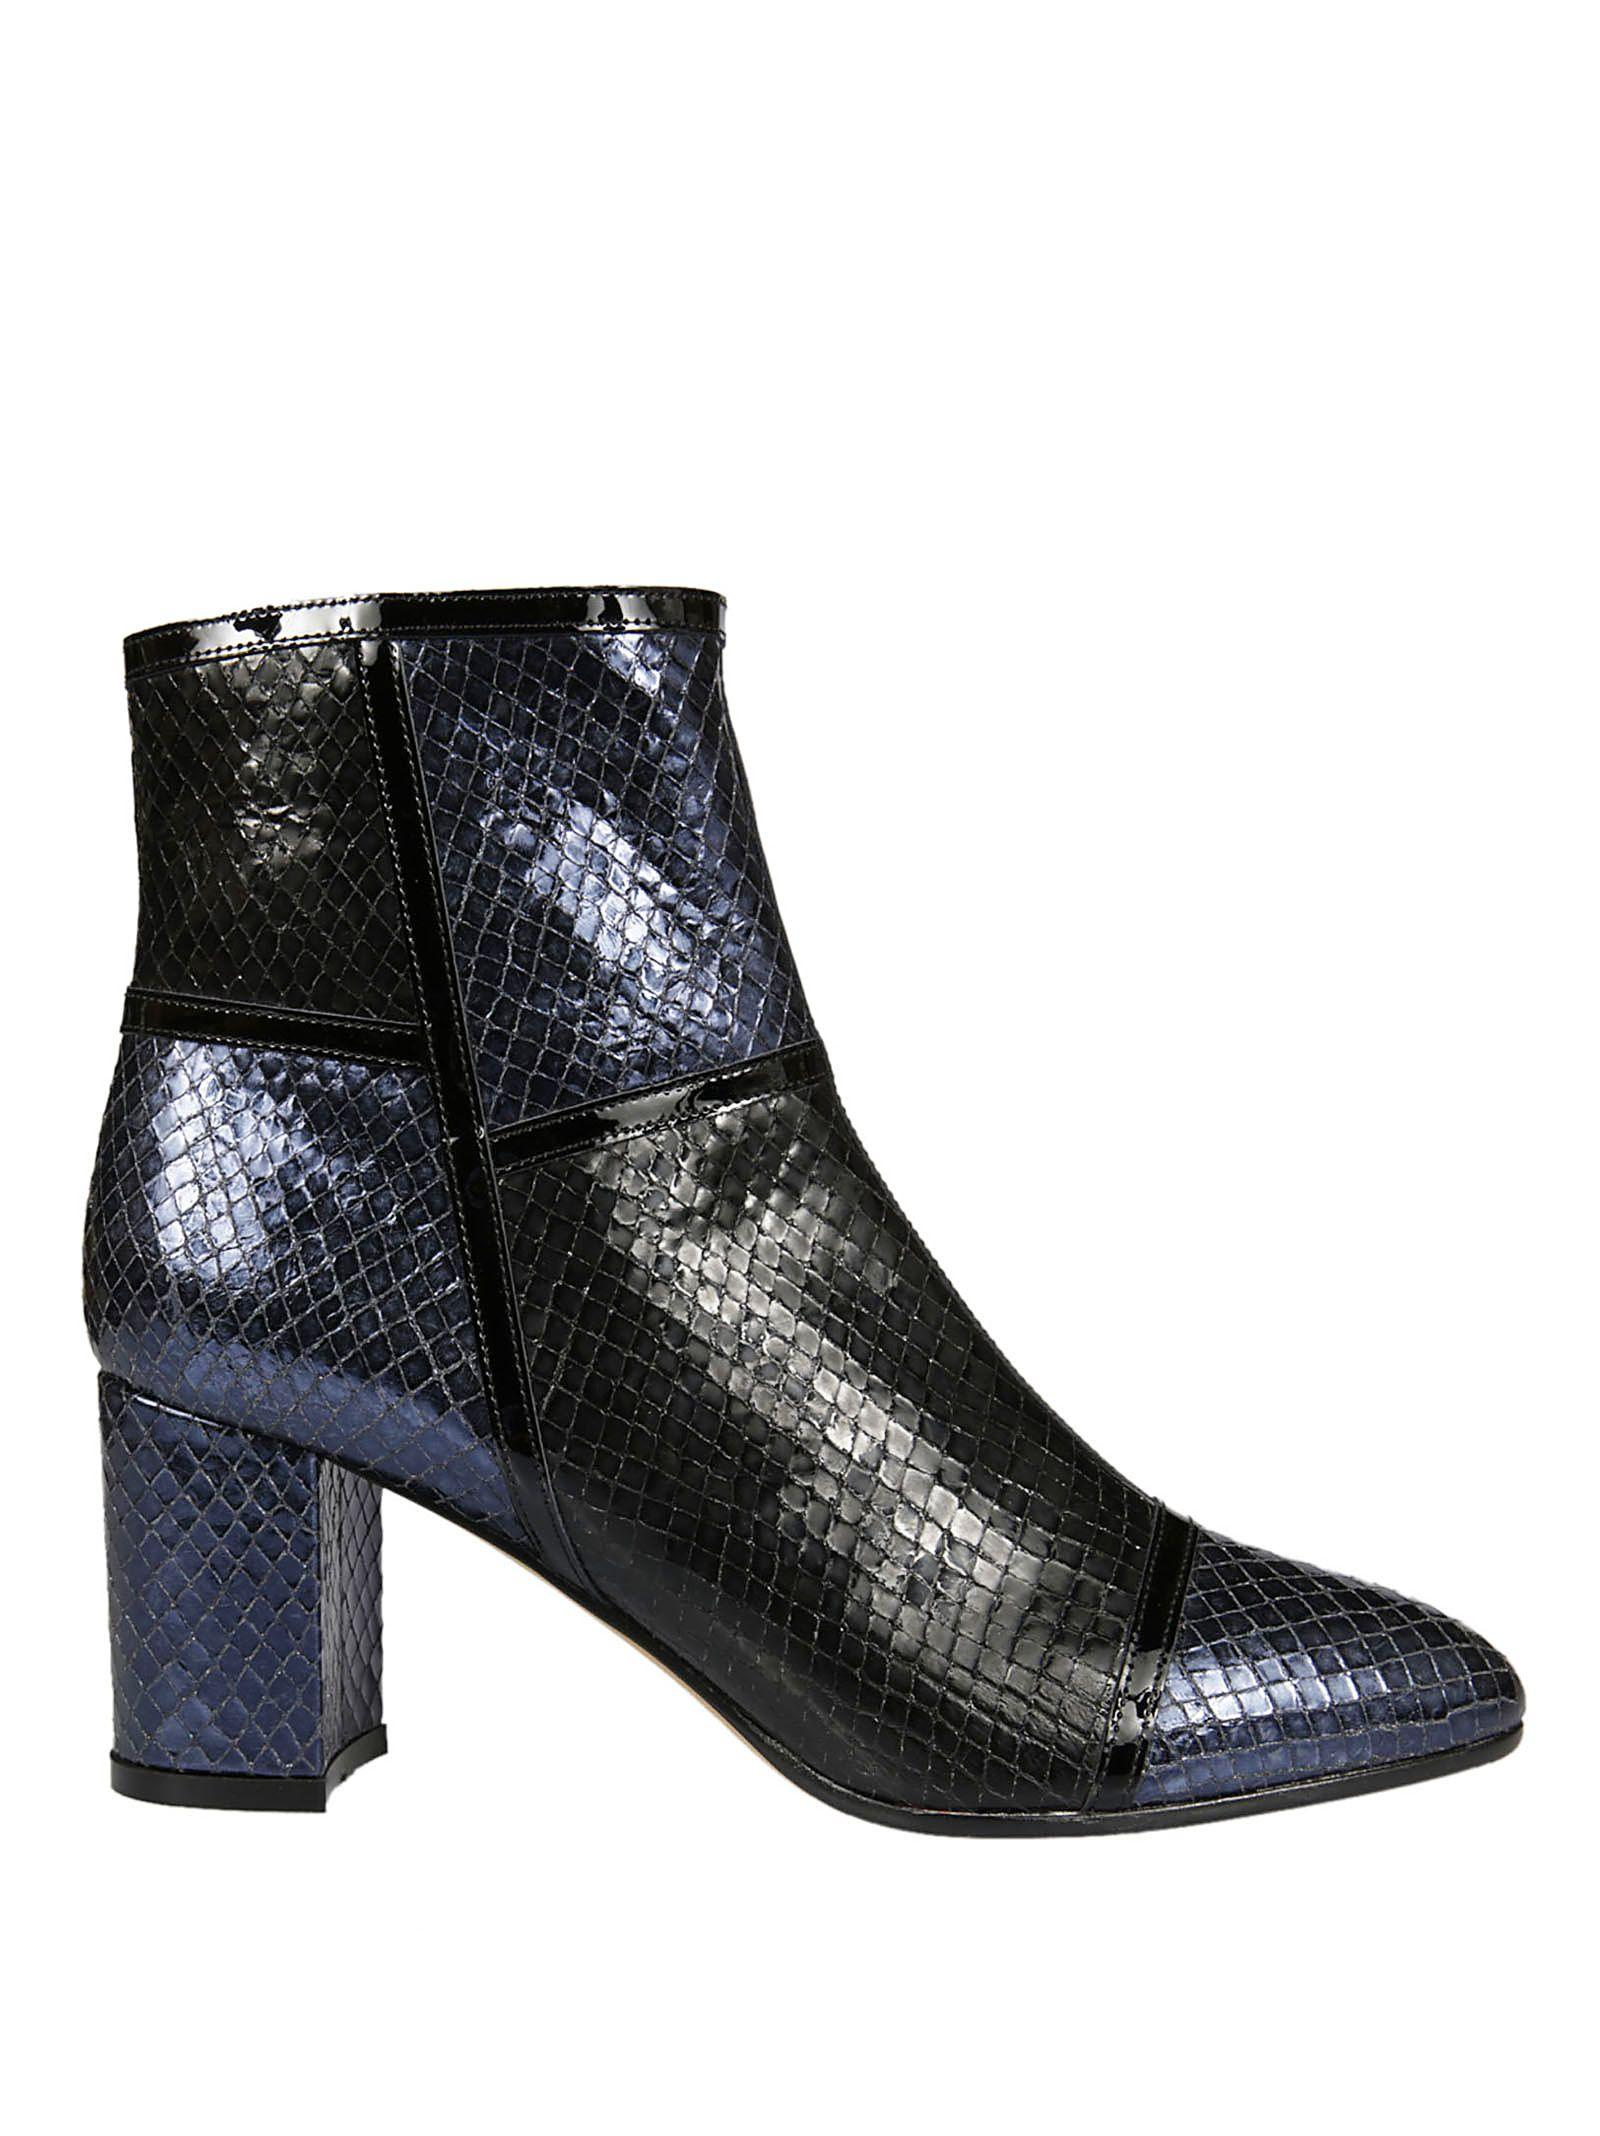 Jean-michel Cazabat Gail Boots In Blue-black